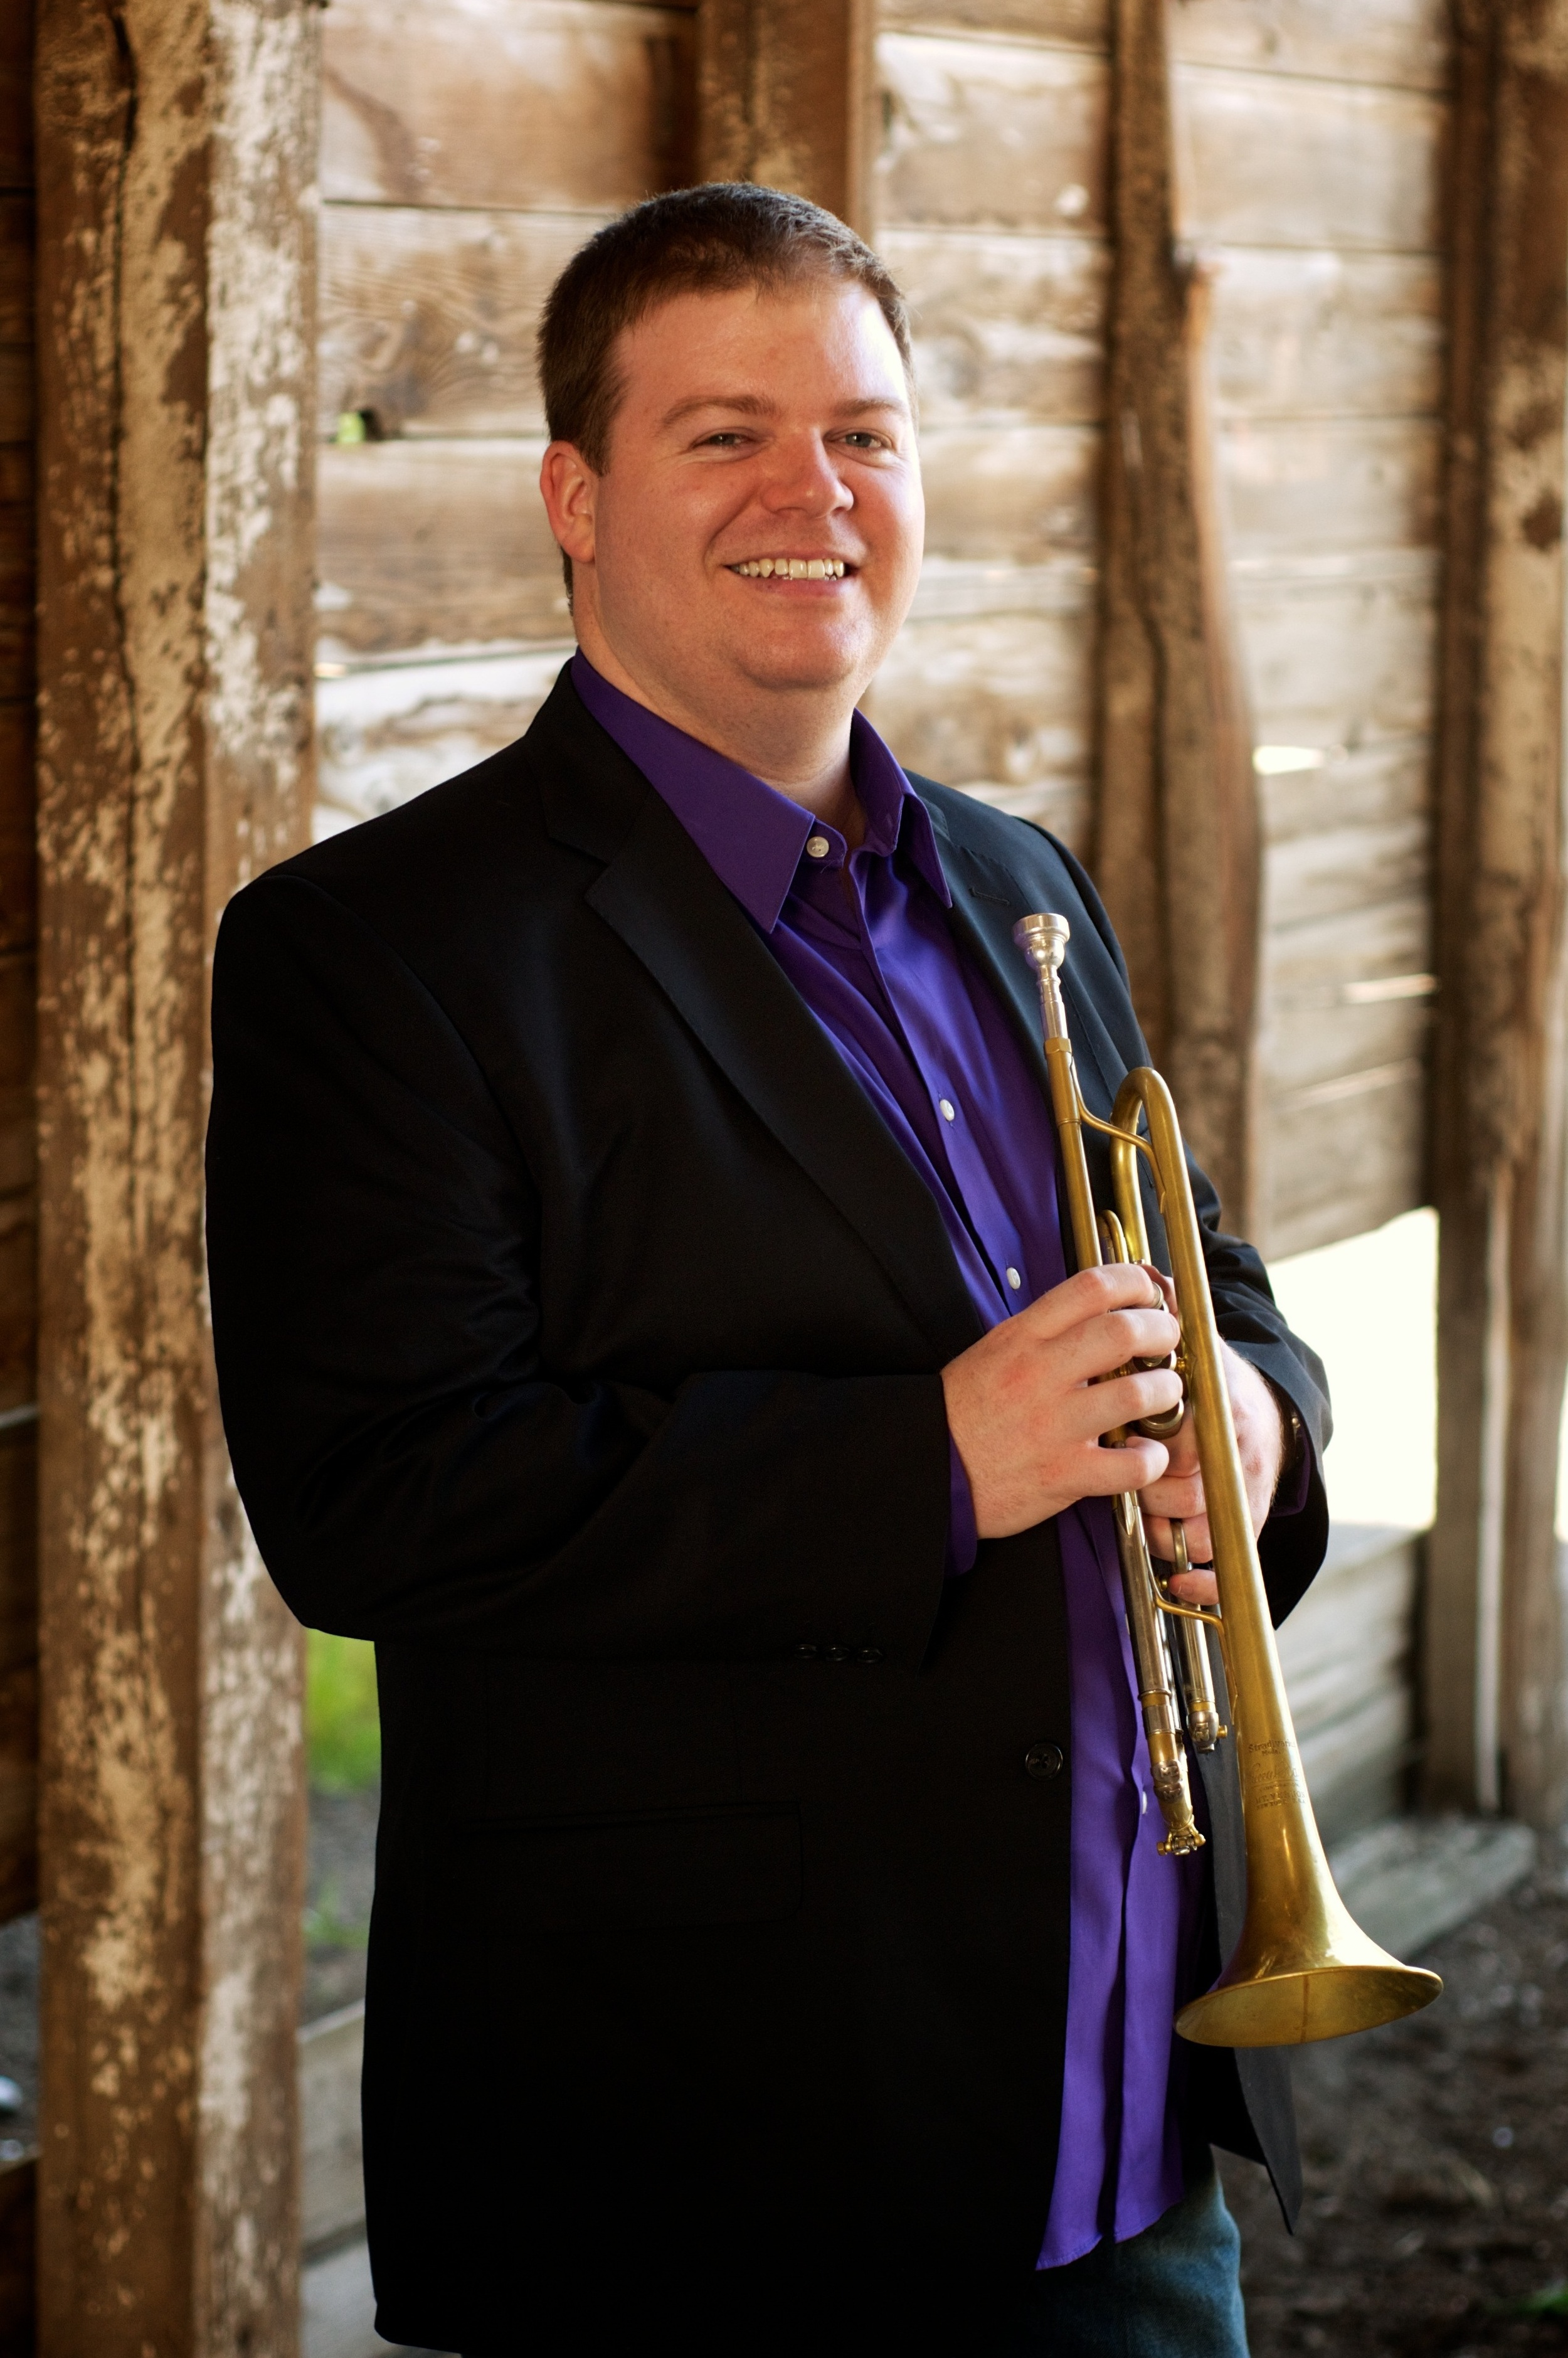 Sean Butterfield, trumpets/arranging  University of Idaho